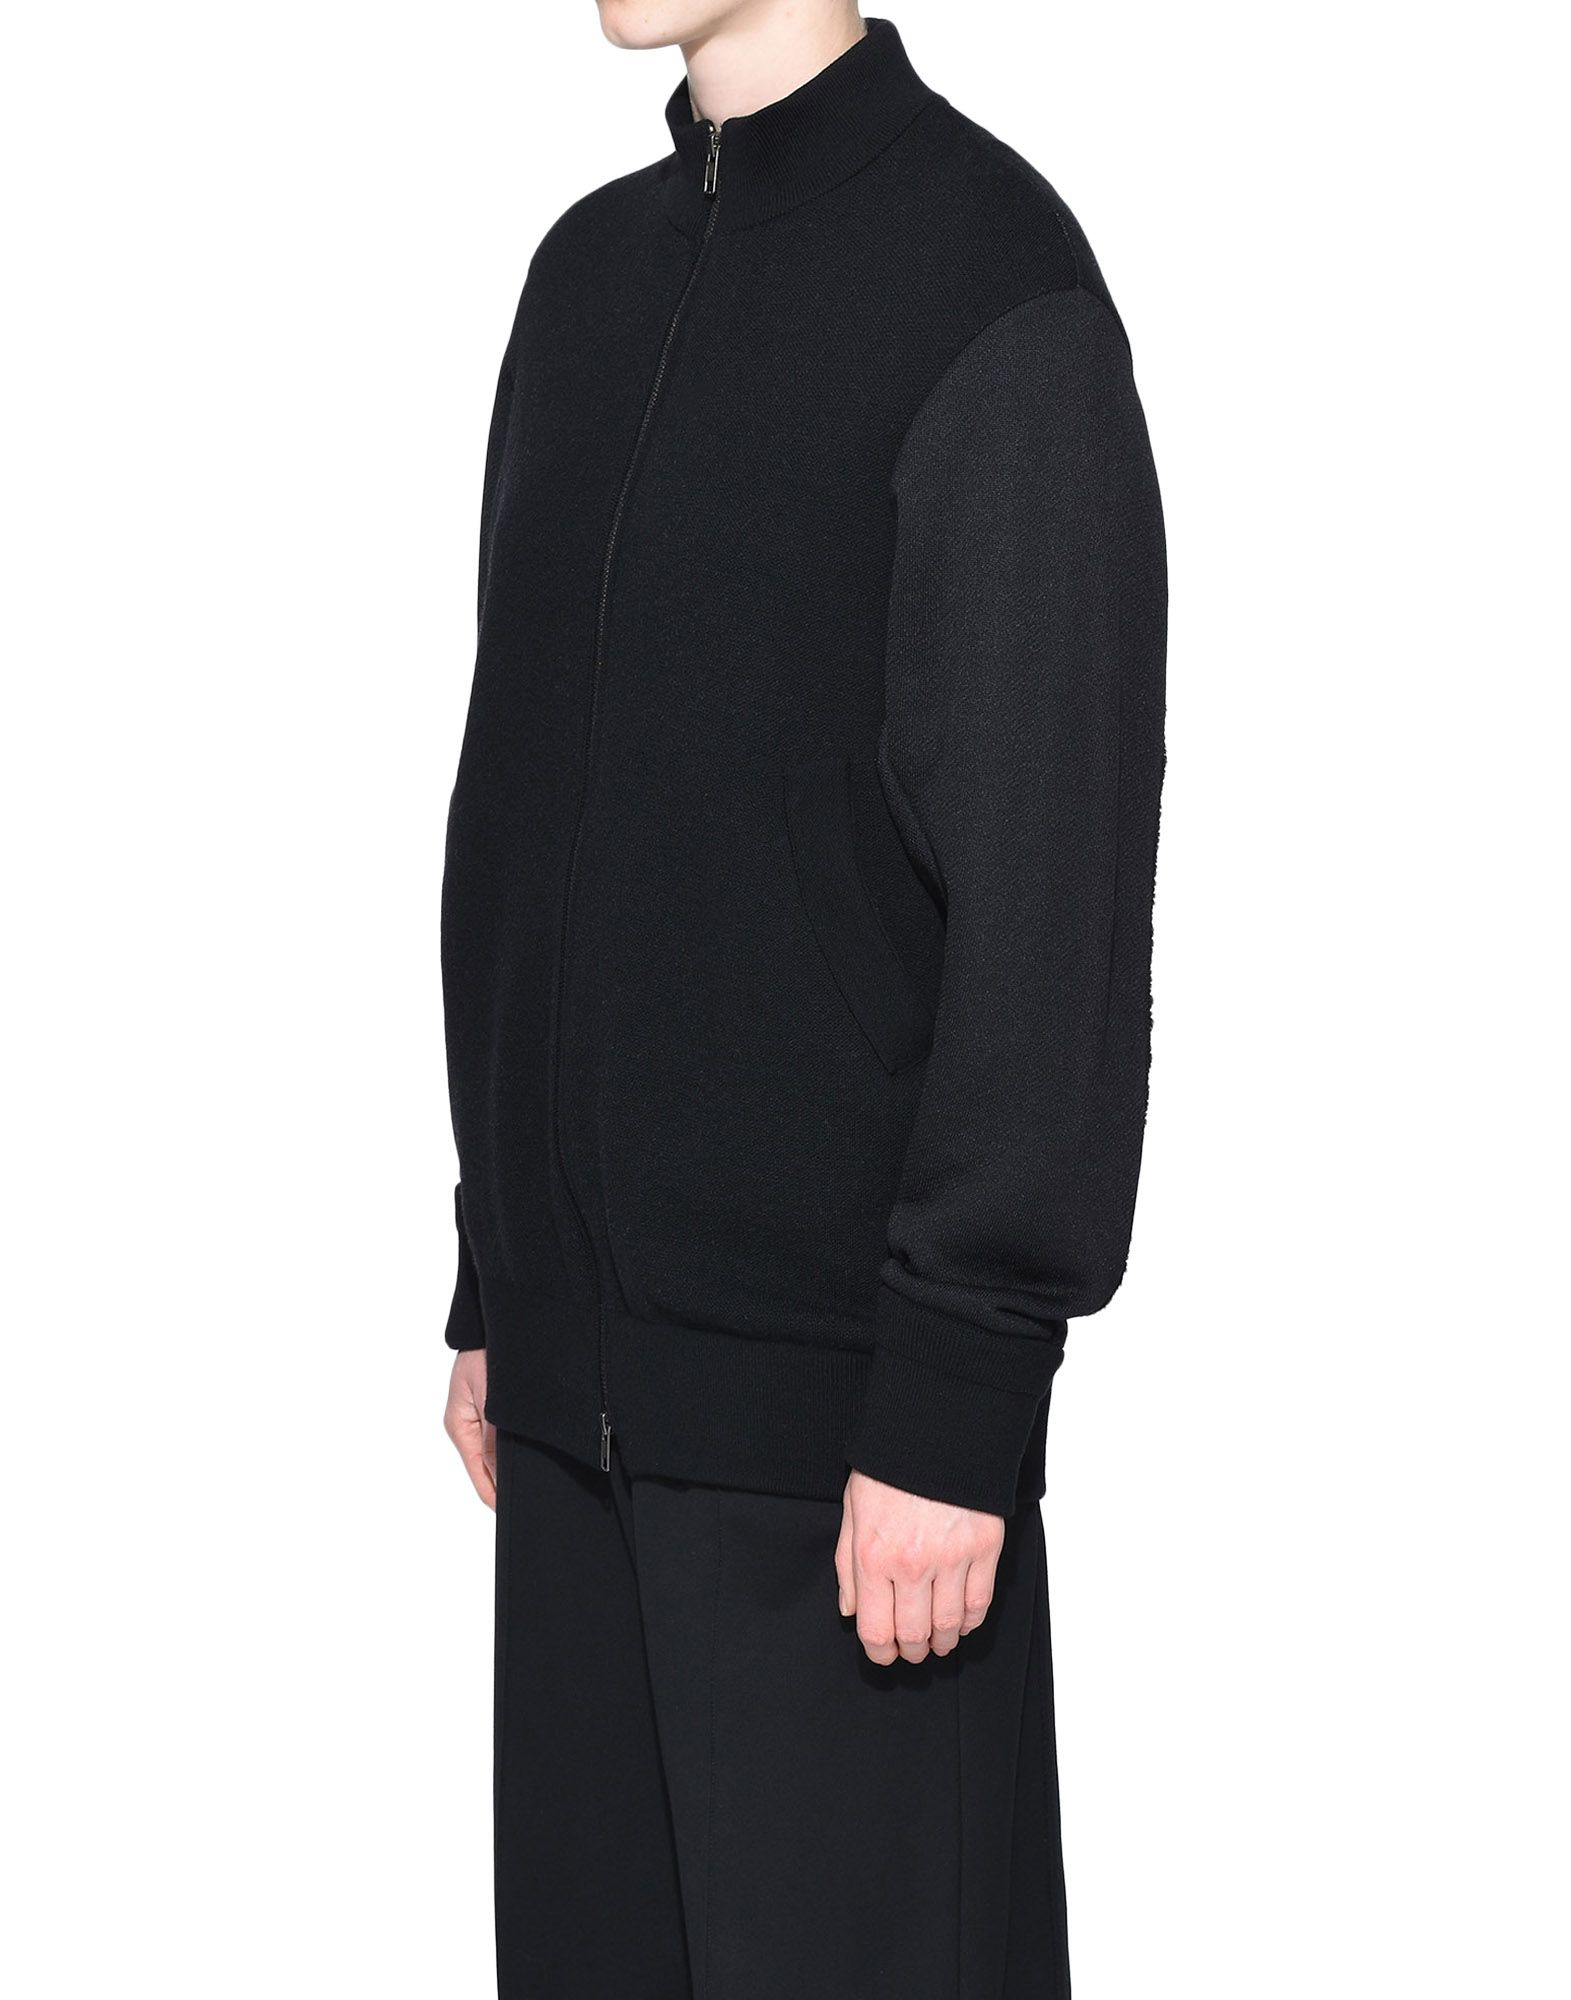 Y-3 Y-3 Knitted Stacked Logo Blouson Blazer Woman e